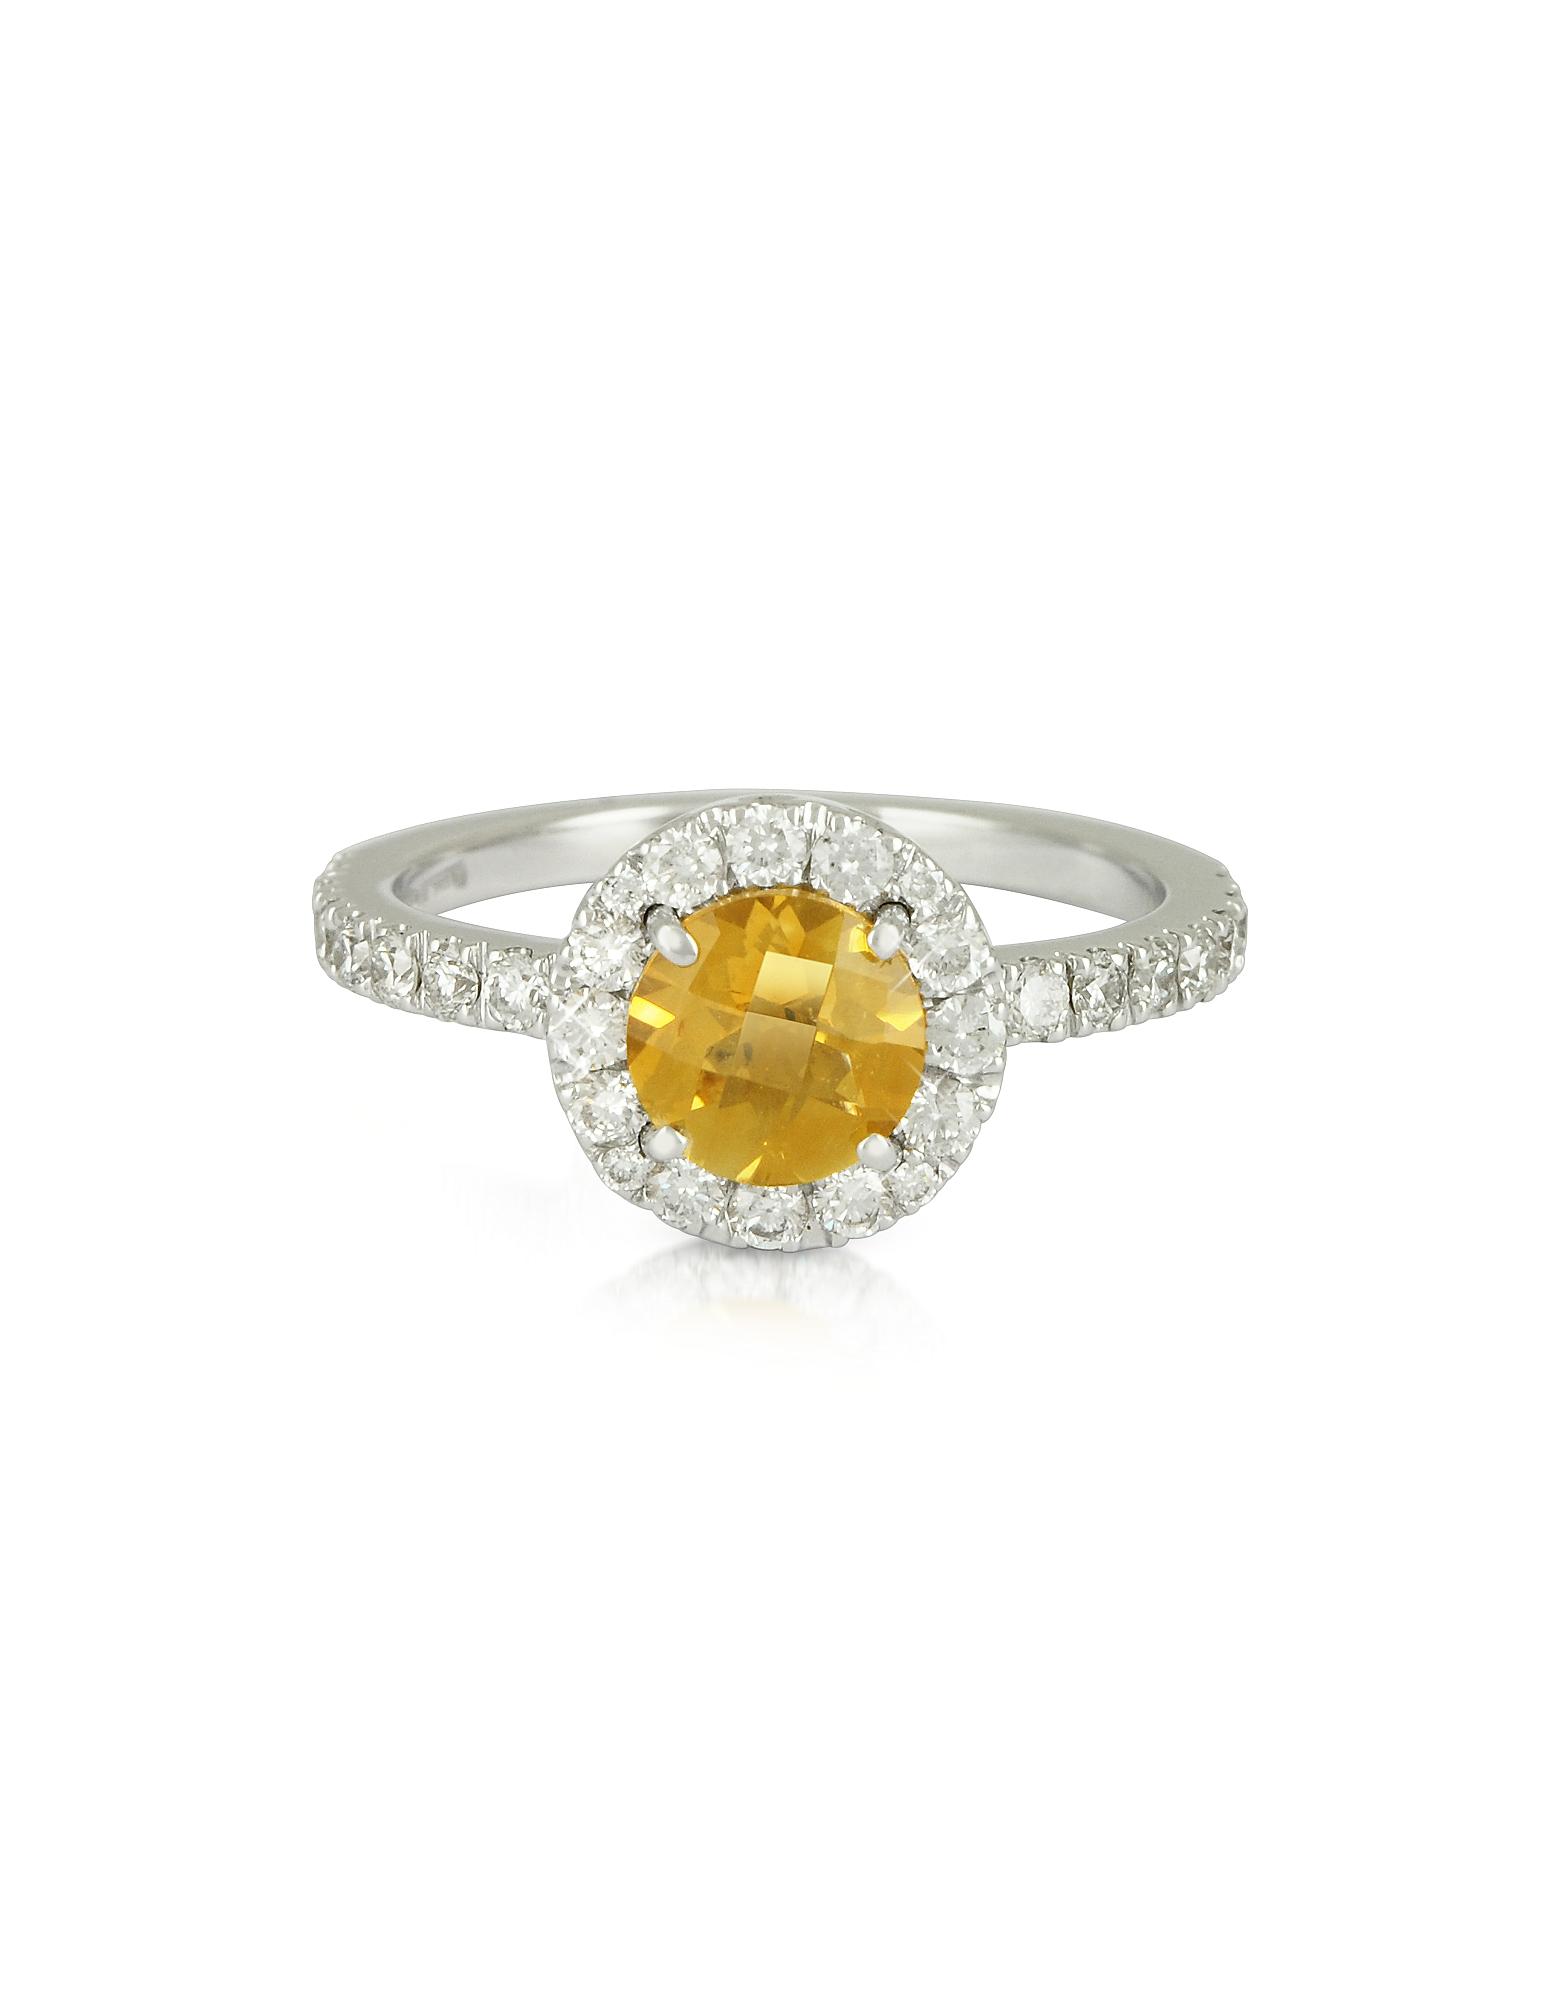 Forzieri 福喜利 戒指, 0.50克拉钻石铺鑲18K白金戒指配黄水晶石英